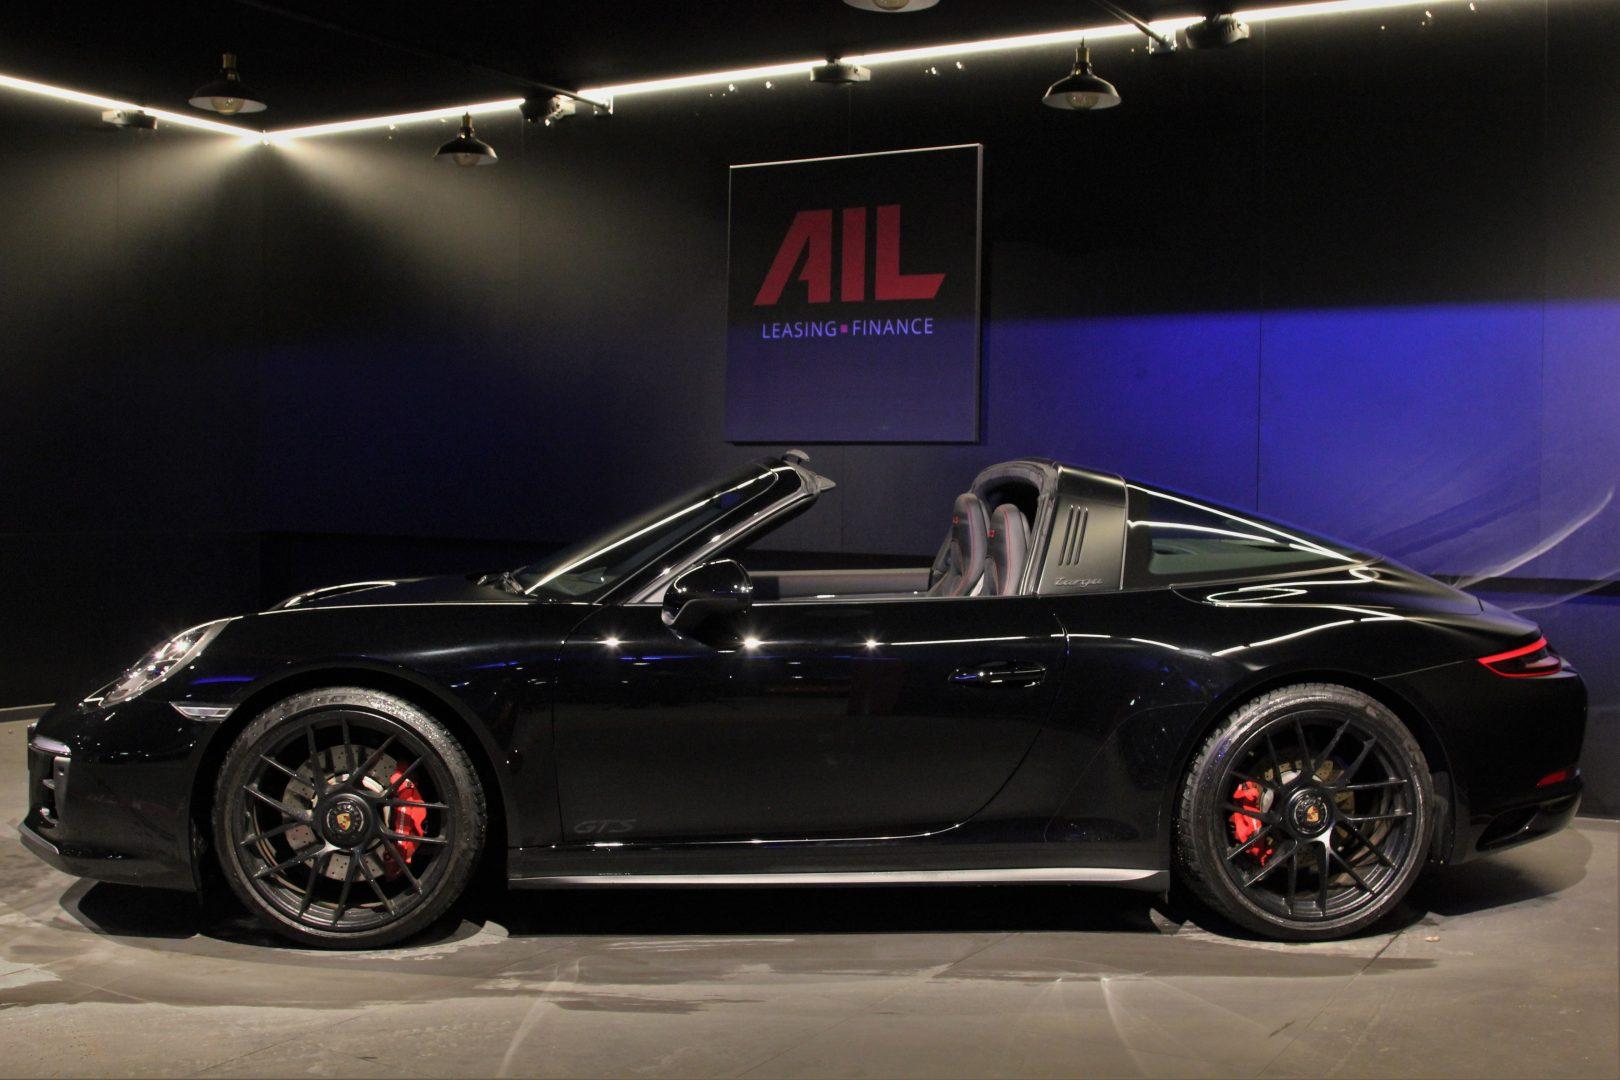 AIL Porsche 911 991 Targa 4 GTS LED Lift  10